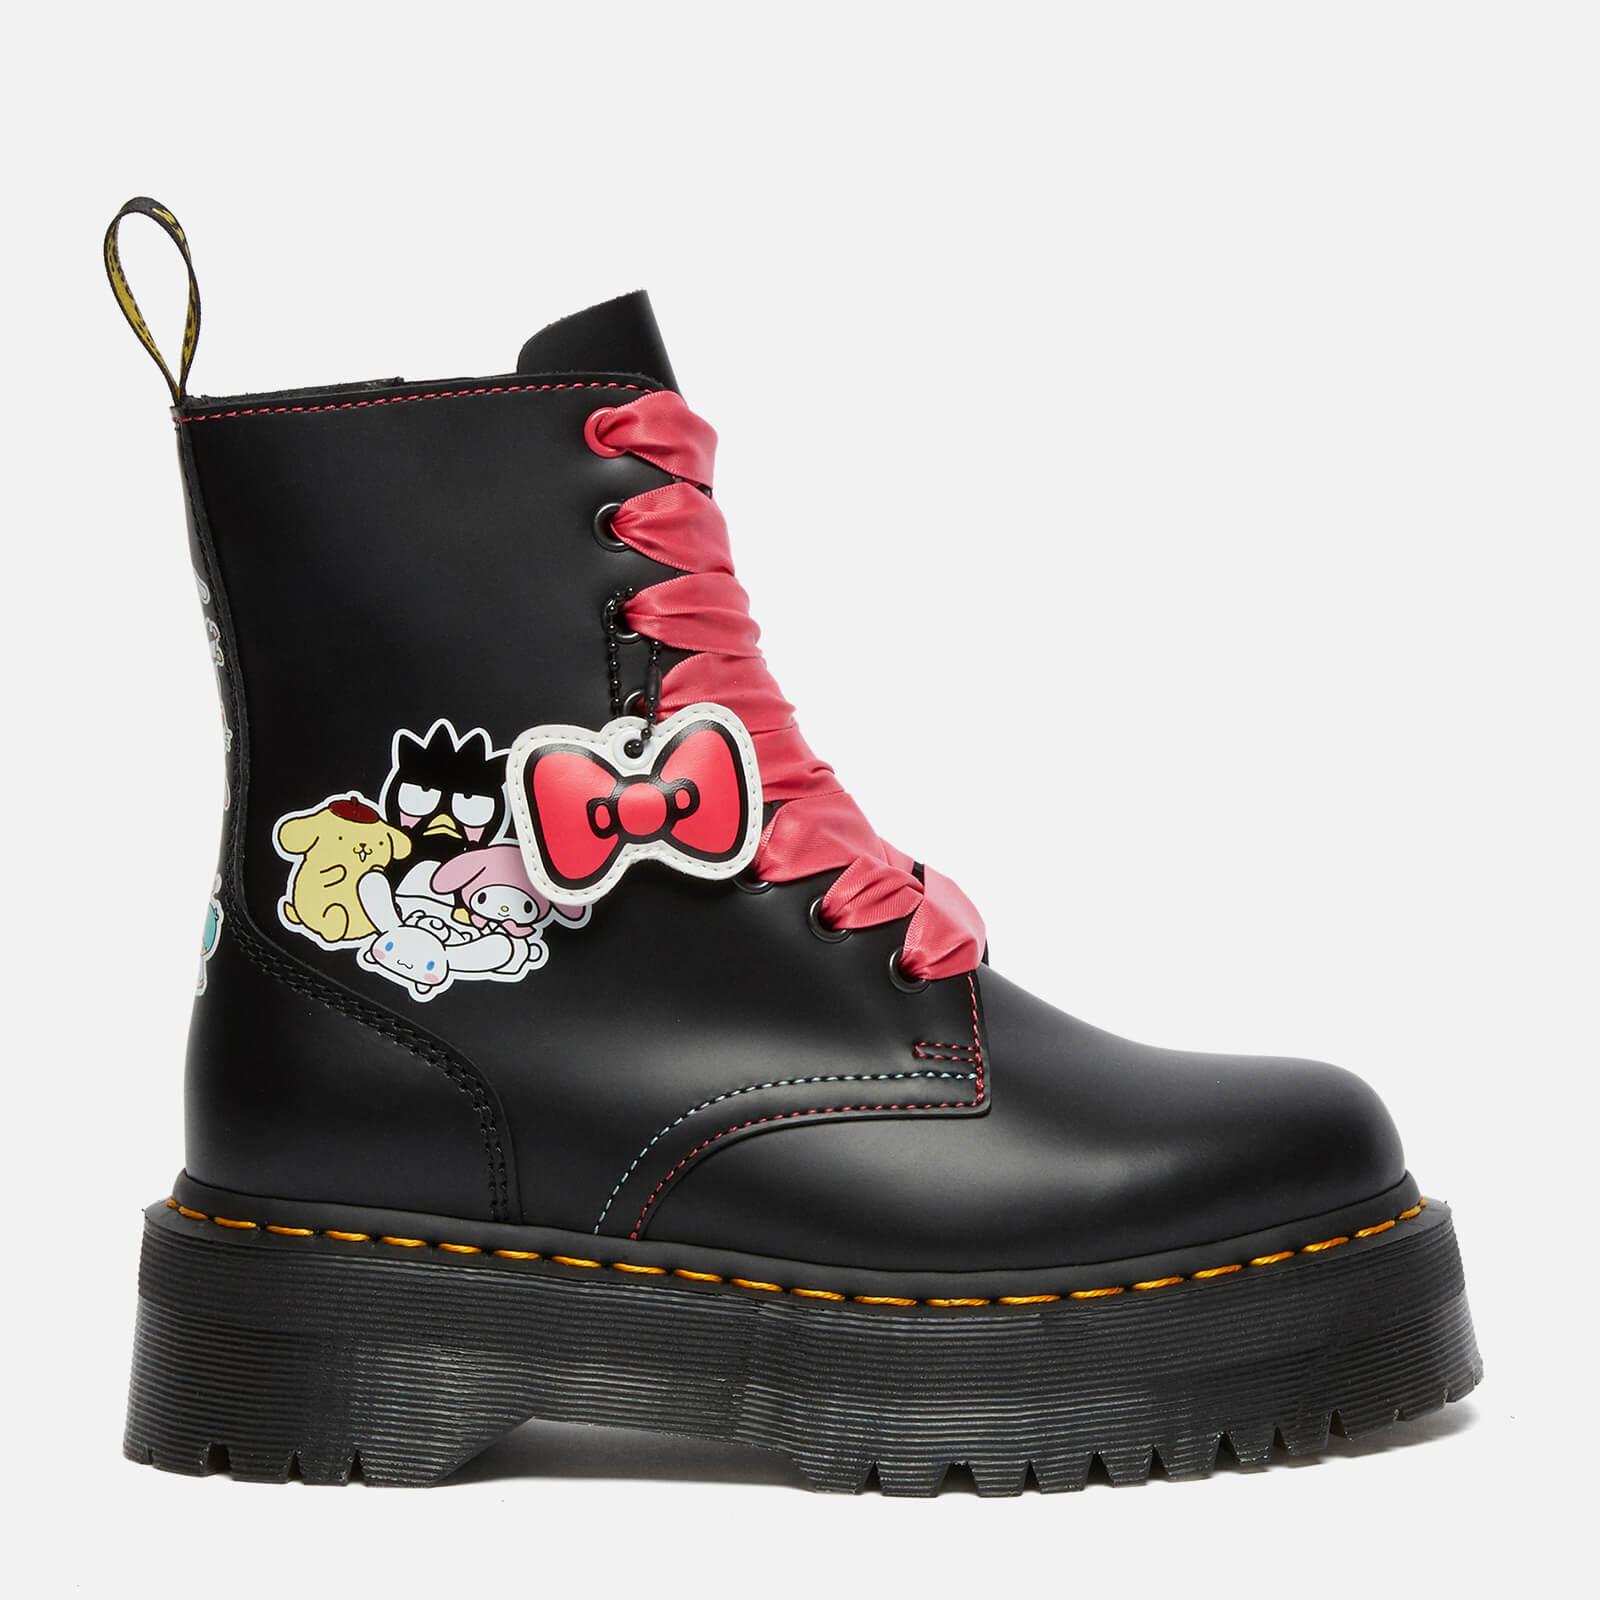 Dr. Martens X Hello Kitty Women's Jadon Leather Boots - Black - Uk 3